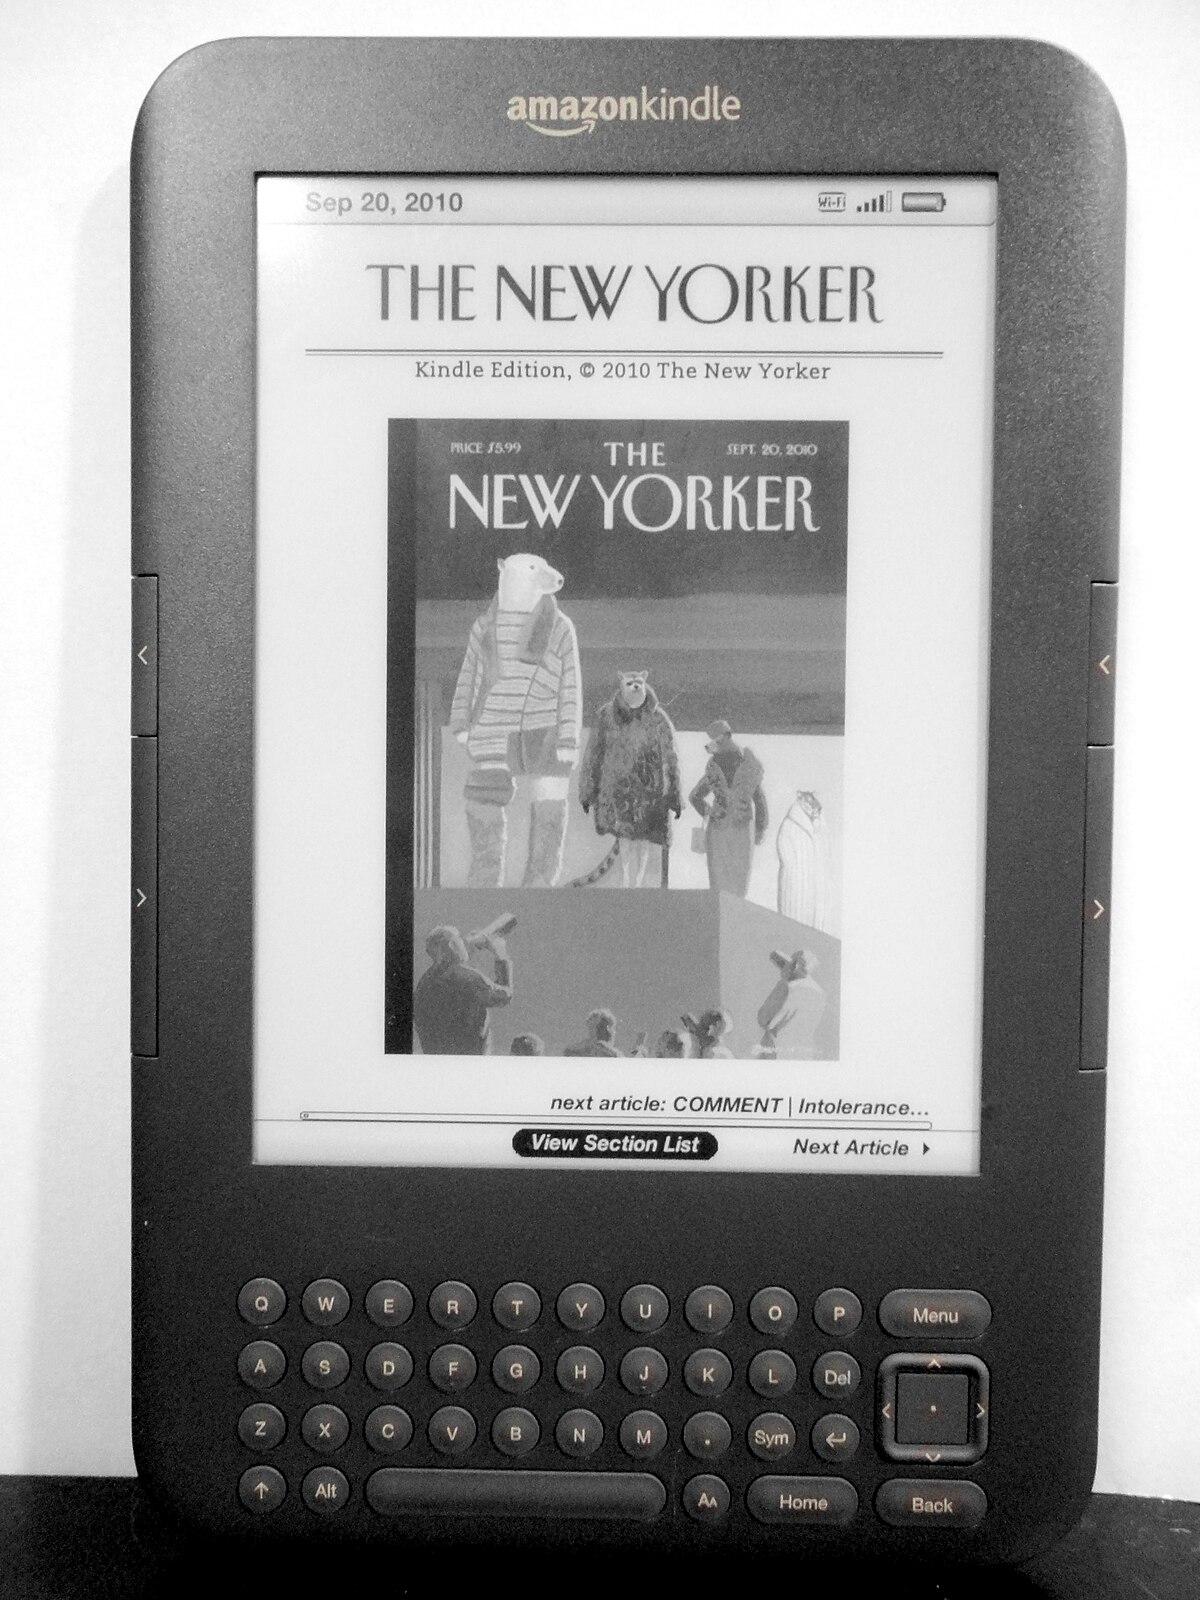 Ebook Gratis Per Kindle